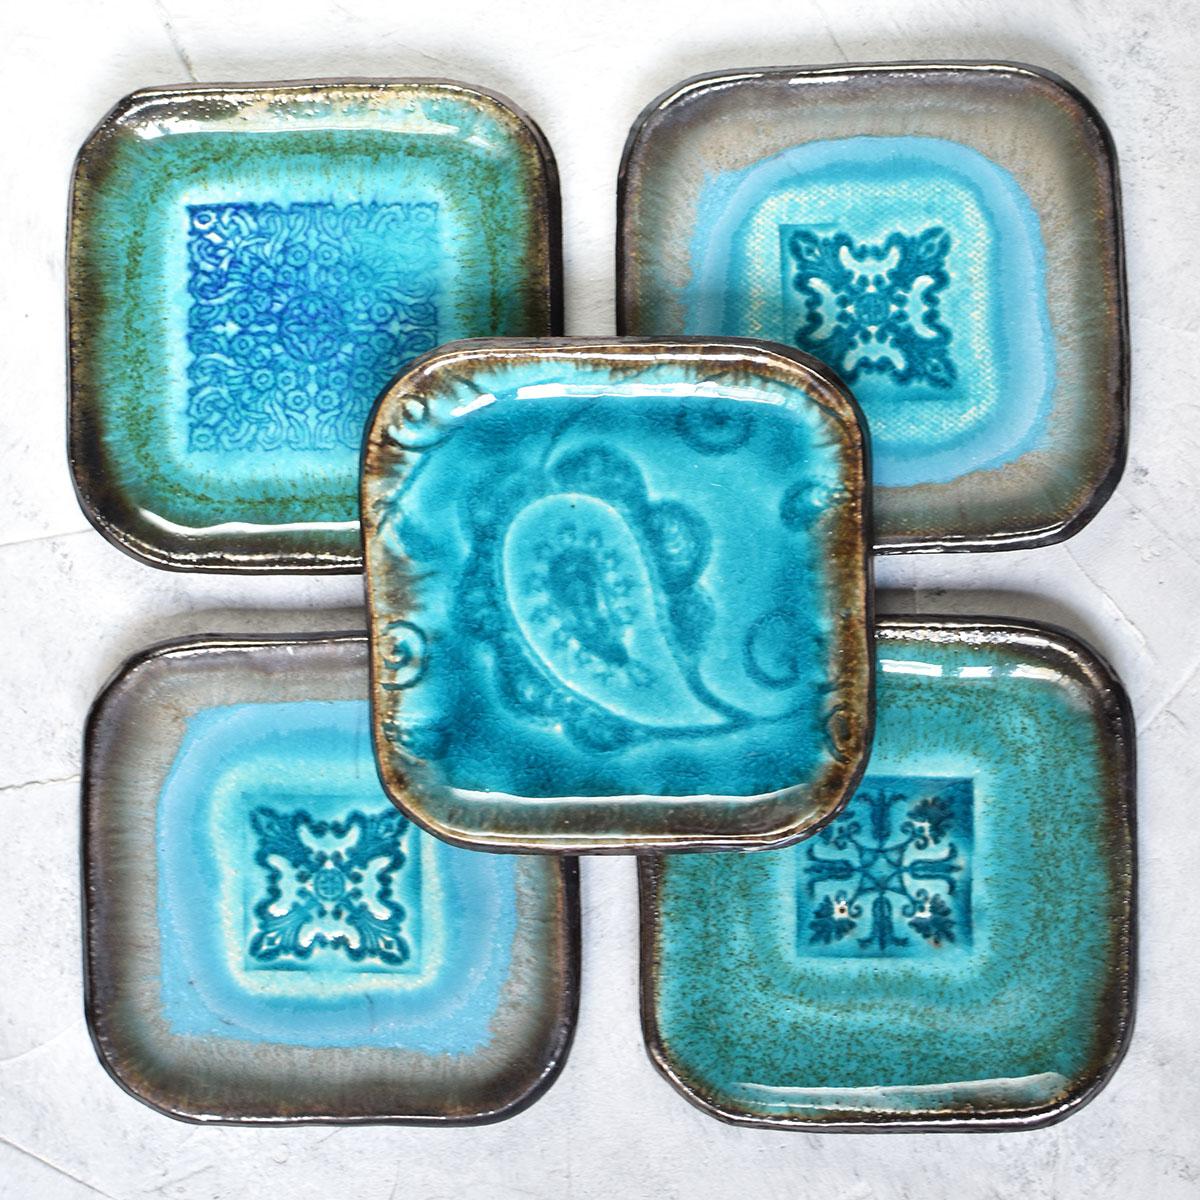 картинка Тарелка квадратная малая с рельефным узором - DishWishes.Ru